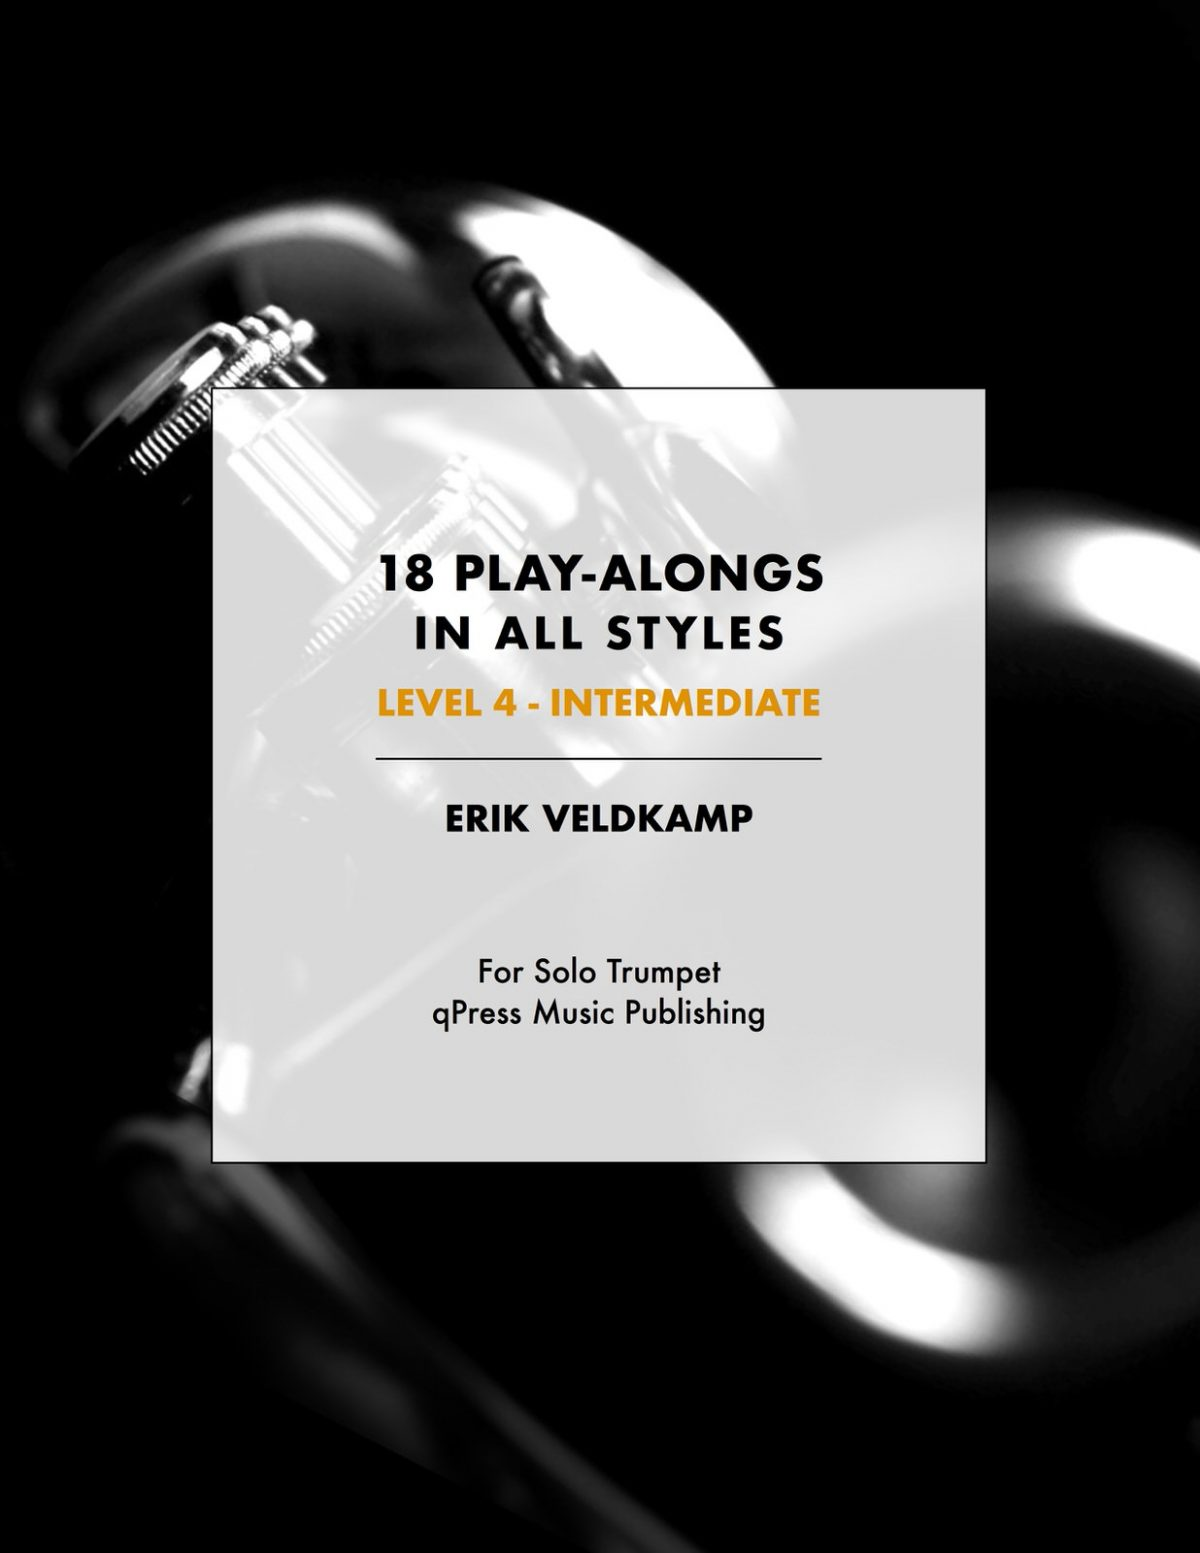 18 Play-Alongs in All Styles Level 4 (Intermediate)-p01